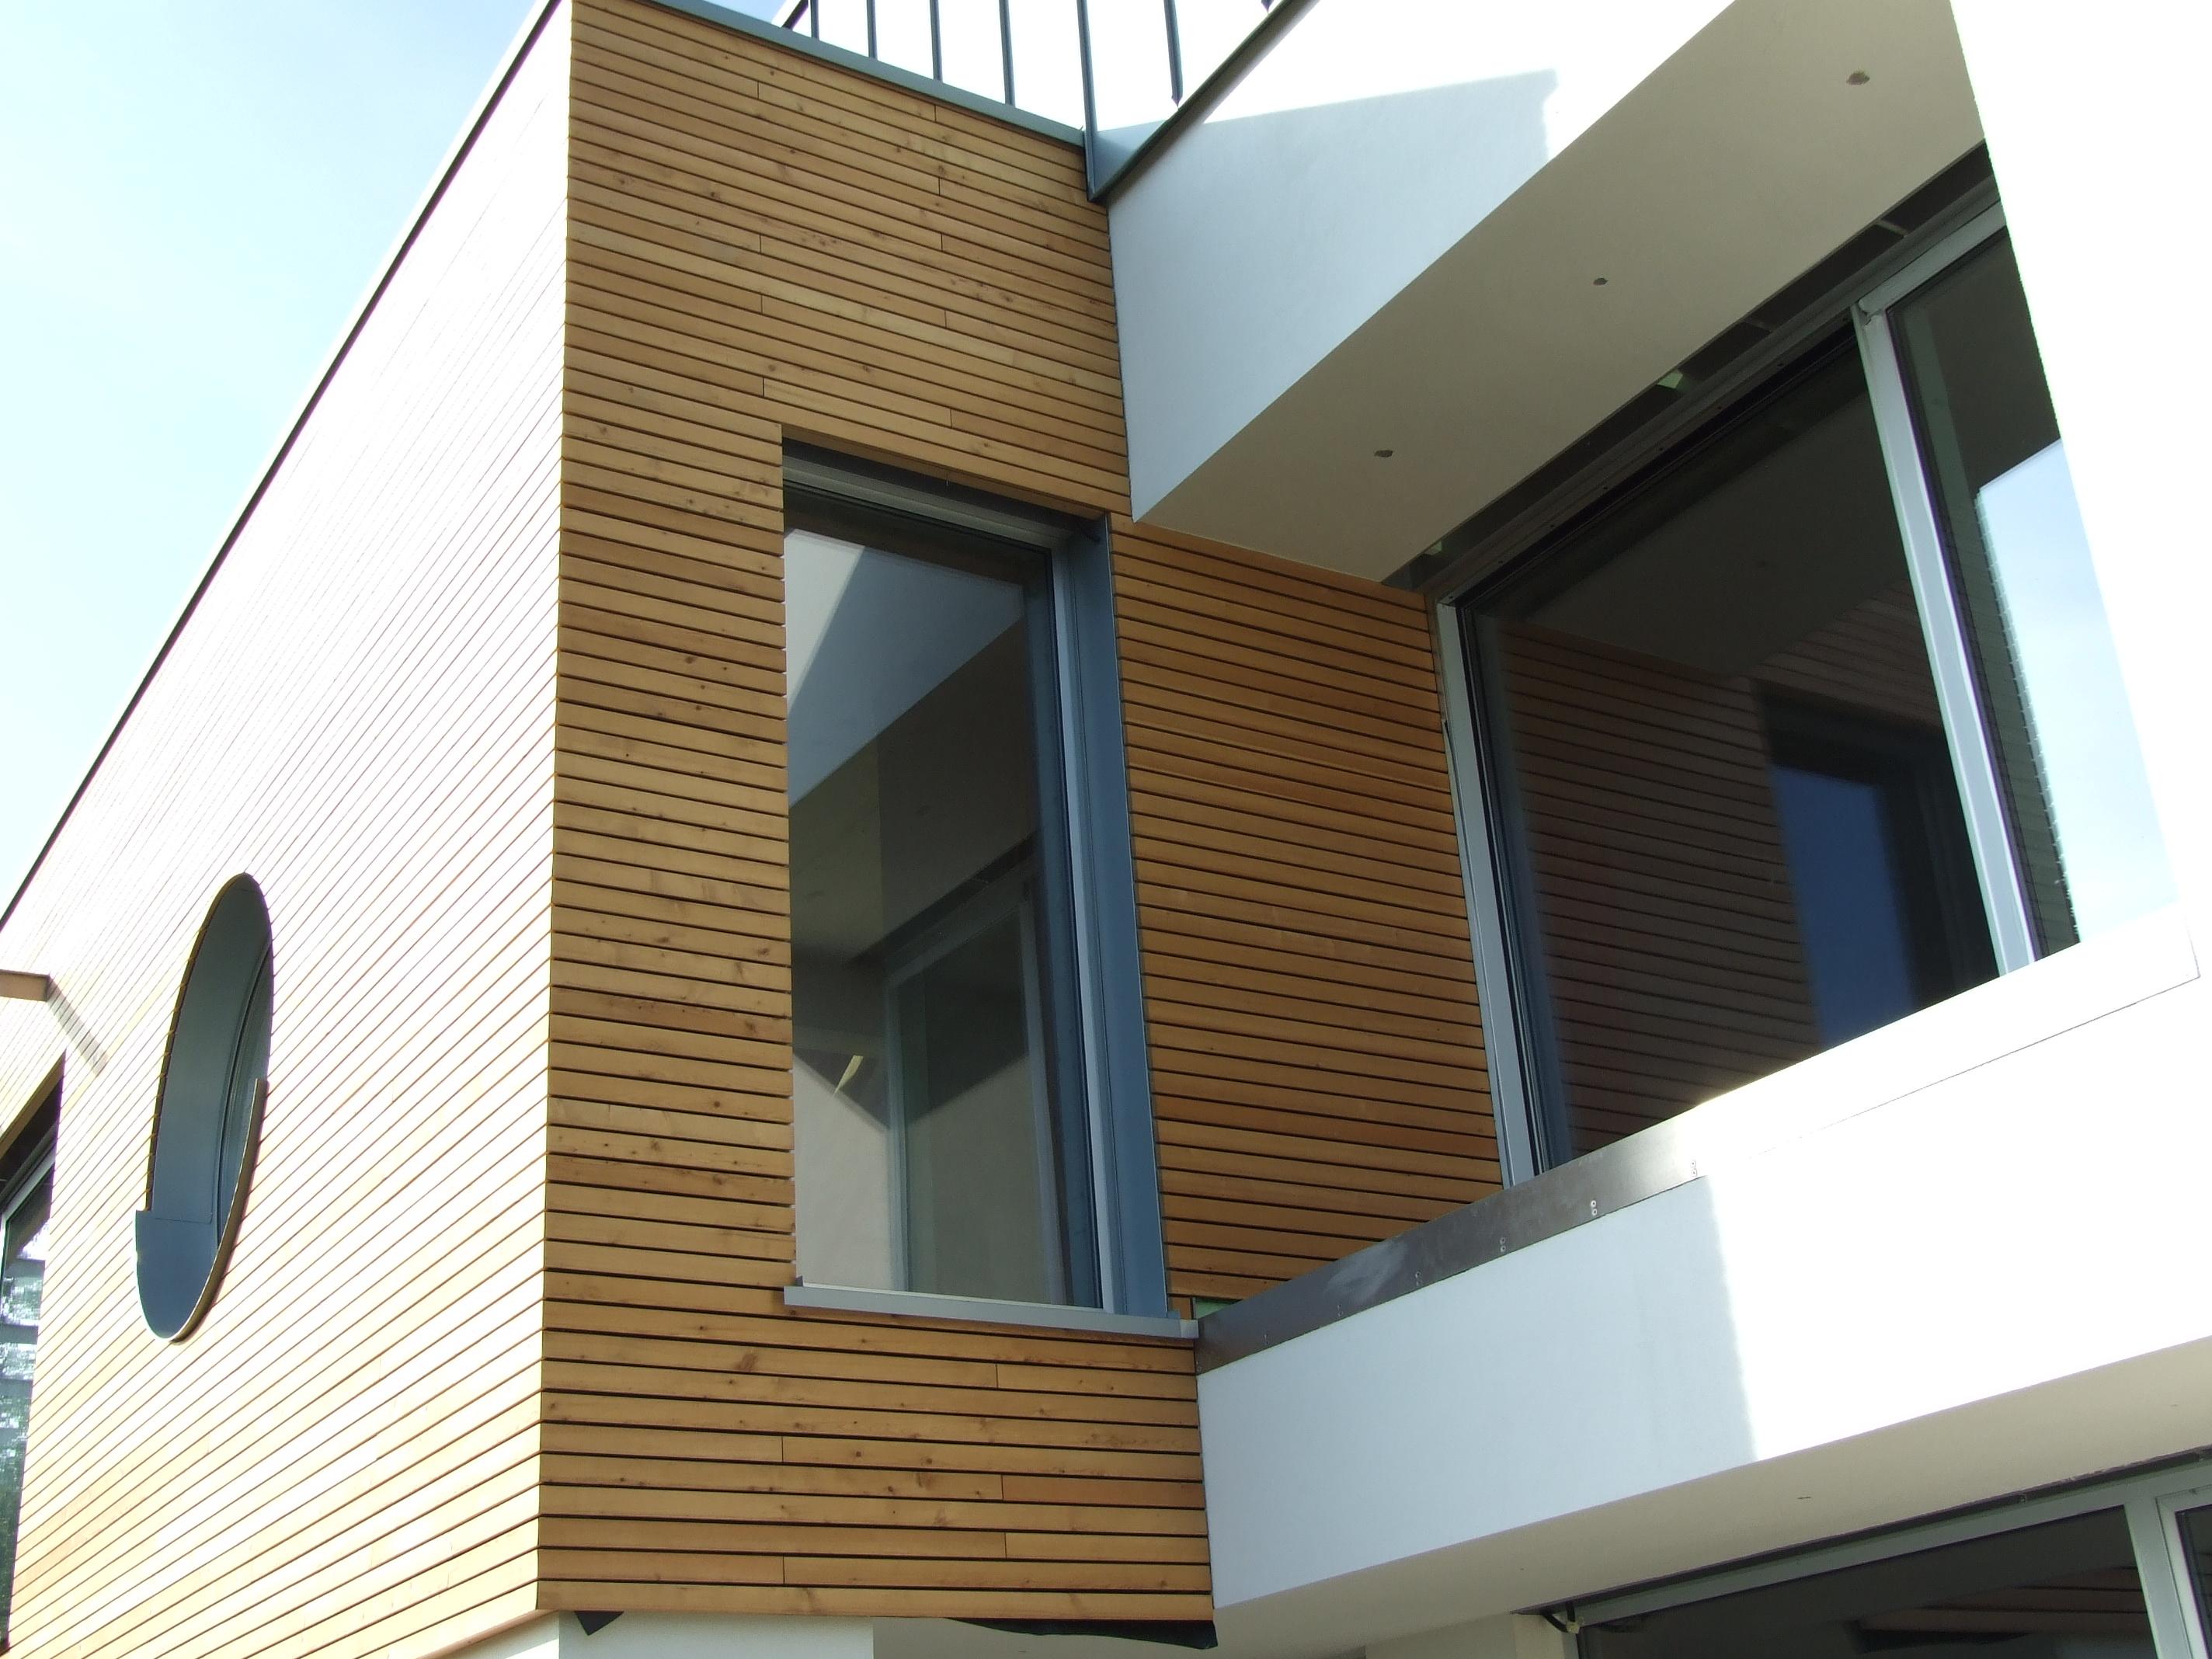 Lesena fasada Mozjanca- sibirski macesen- enaki razmaki med deskami